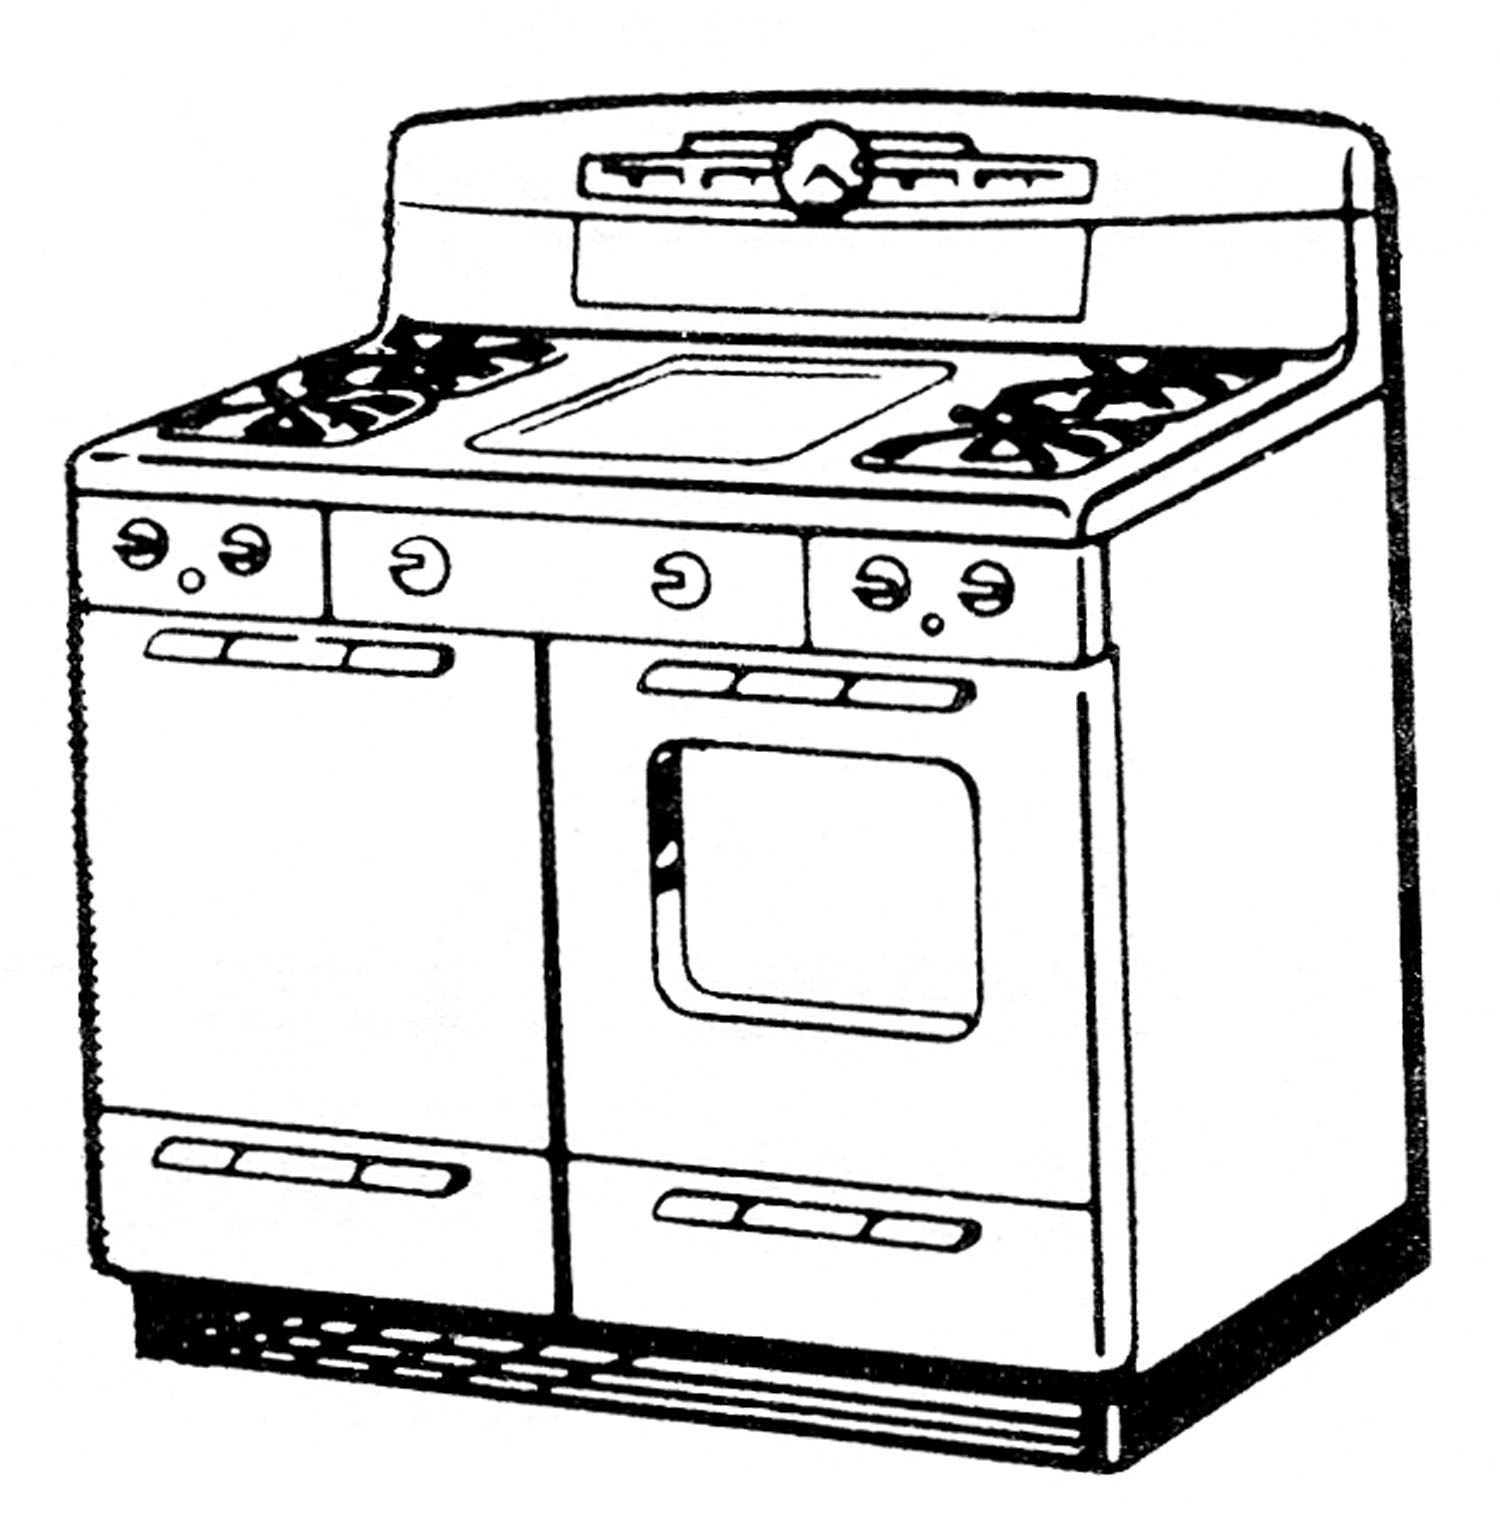 Free clipart stove 1 » Clipart Portal.